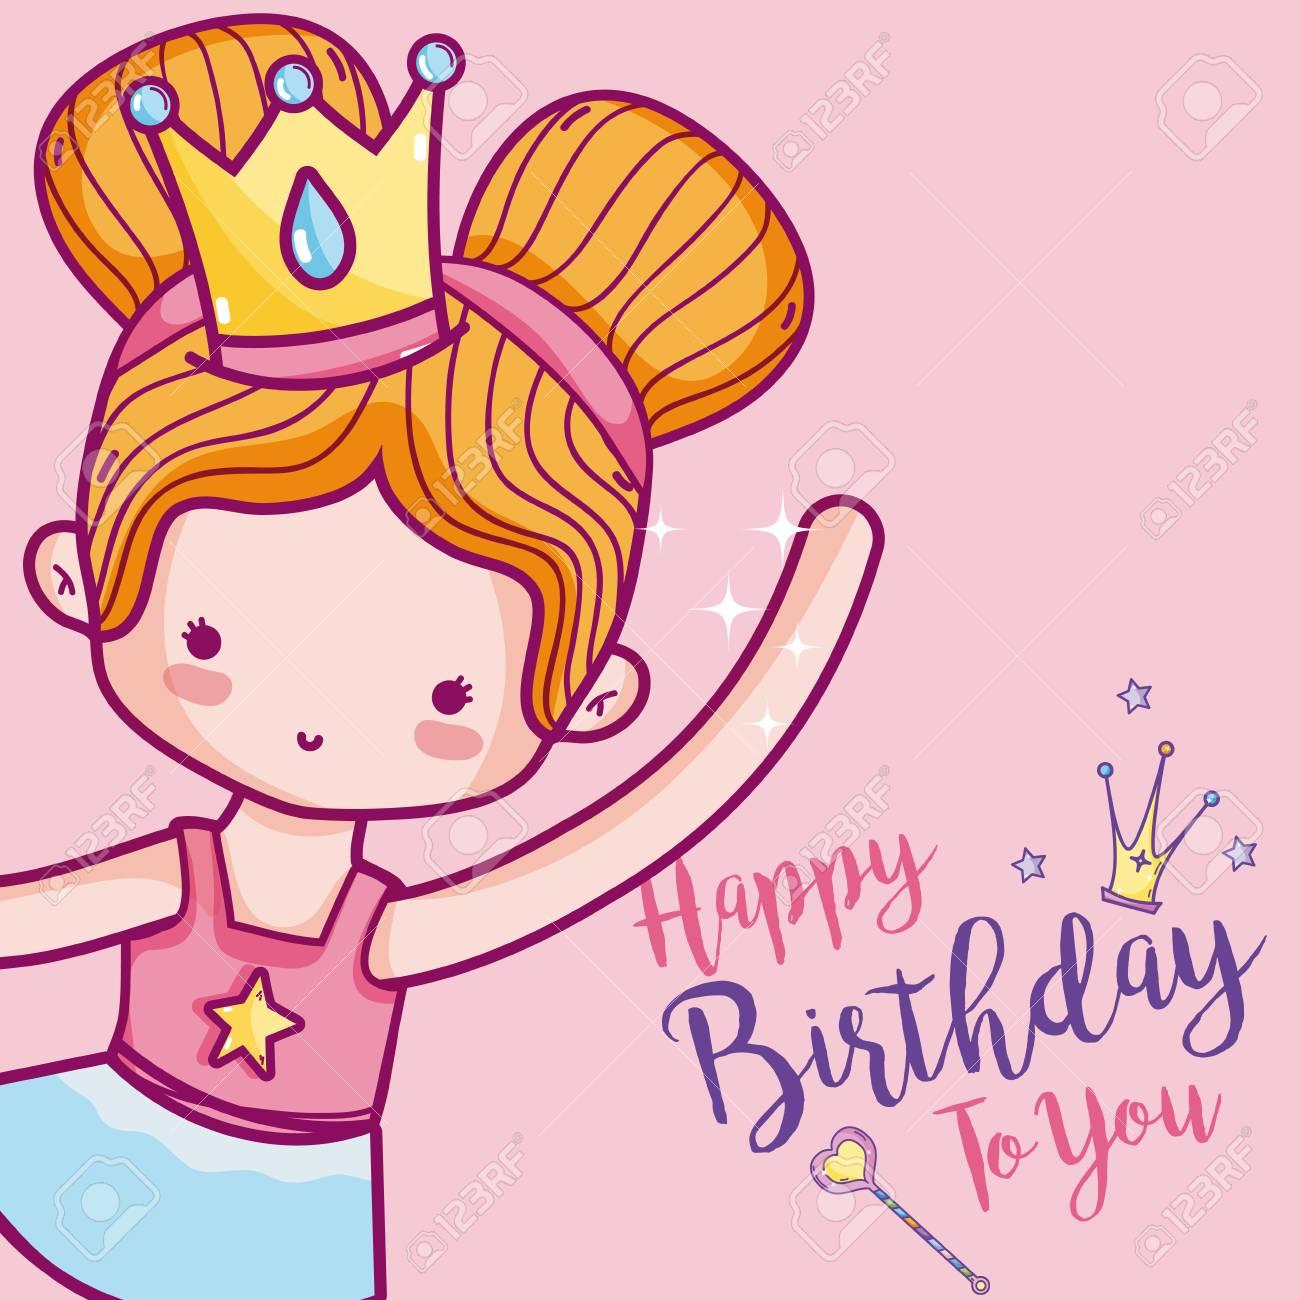 Happy Birthday Card Cute Girl Ballet Dancer Cartoon Vector Illustration Royalty Free Cliparts Vectors And Stock Illustration Image 98515051